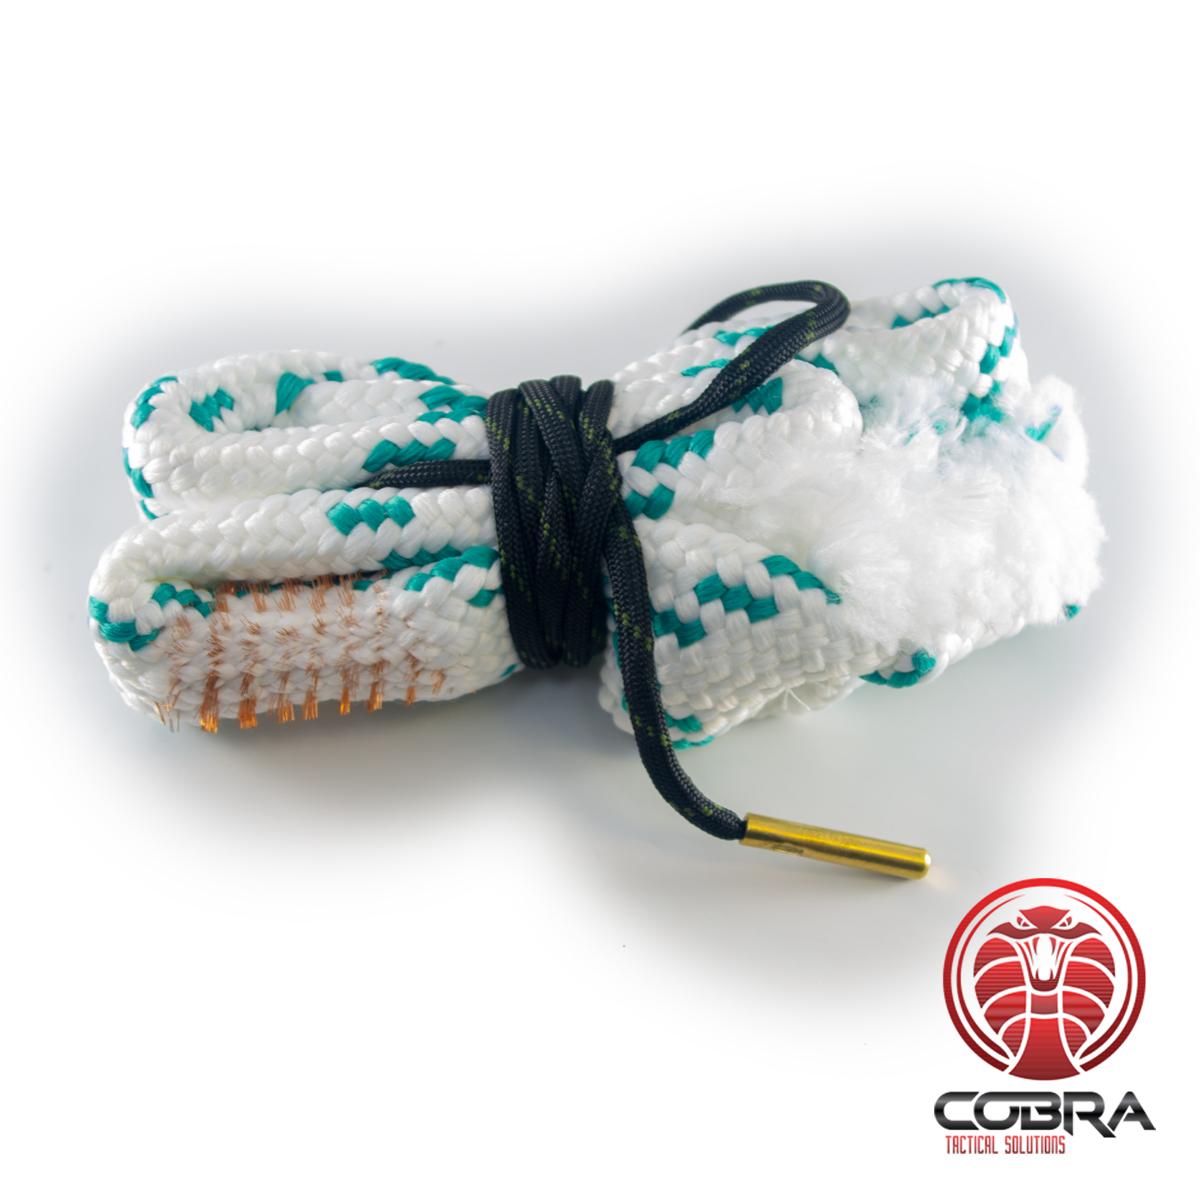 81f437157ea Bore Snake Kaliber 12 | Poets je loop in 10s | Cobra Tactical ...